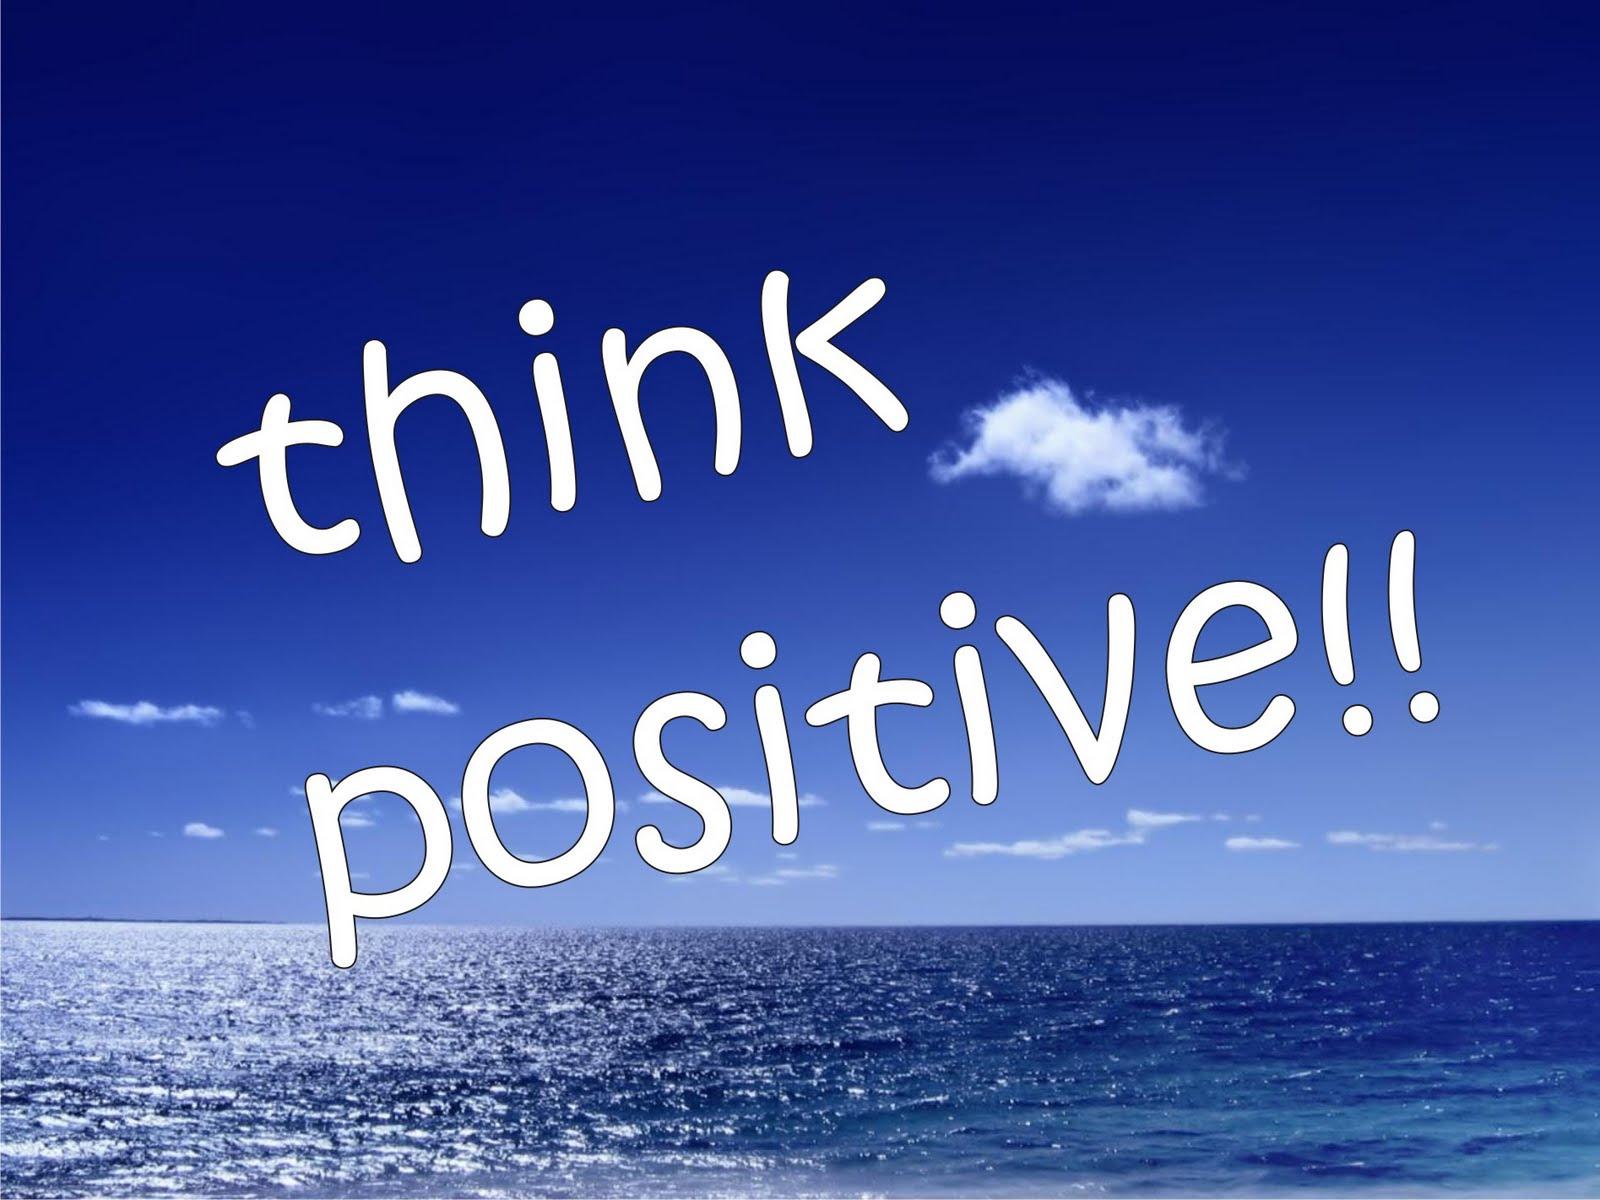 positive energie sprüche Positive Sprüche   ZitateLebenAlle positive energie sprüche